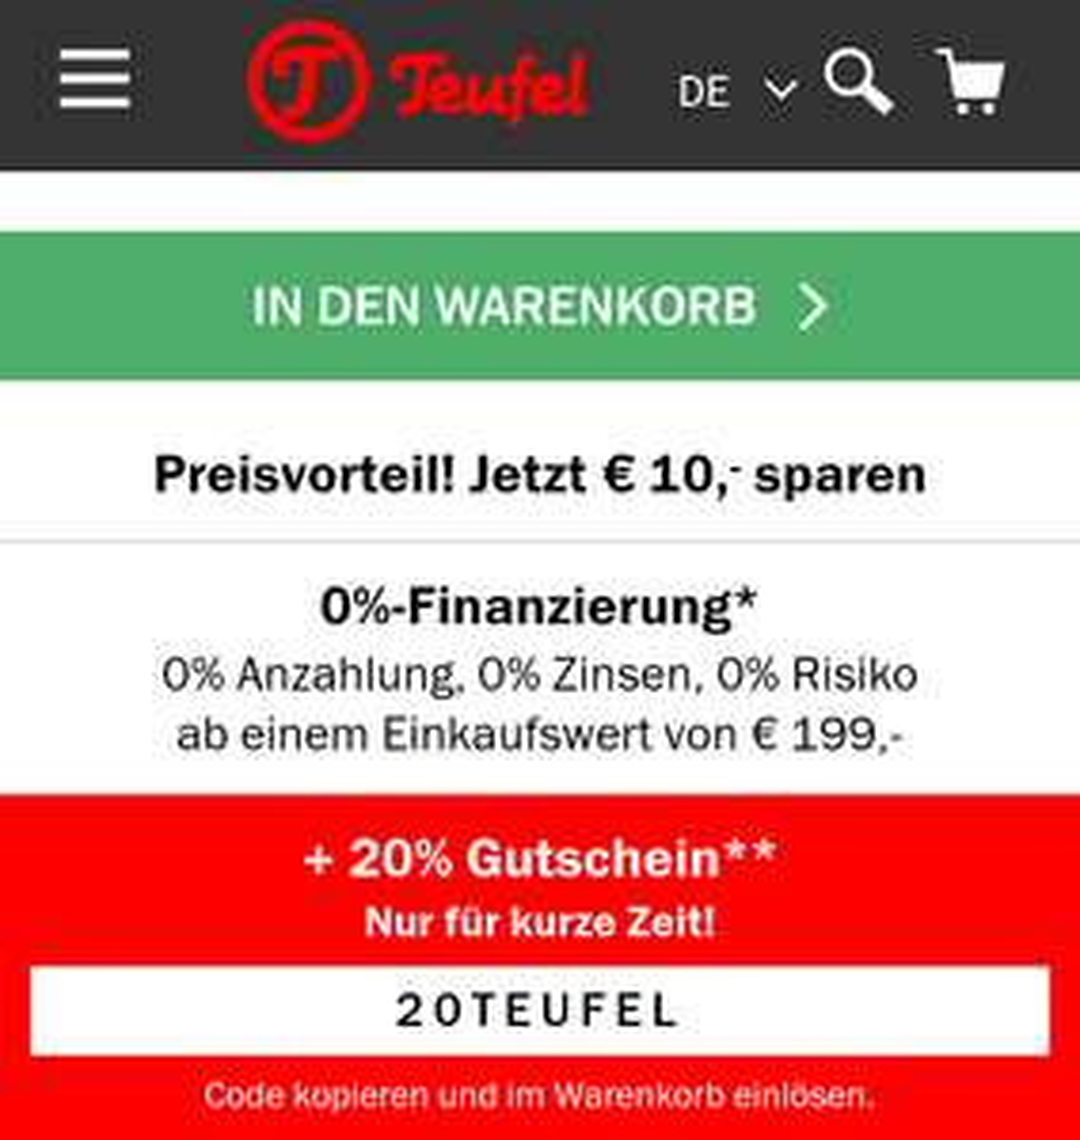 Teufel.de: 20% Rabatt mit Gutscheincode